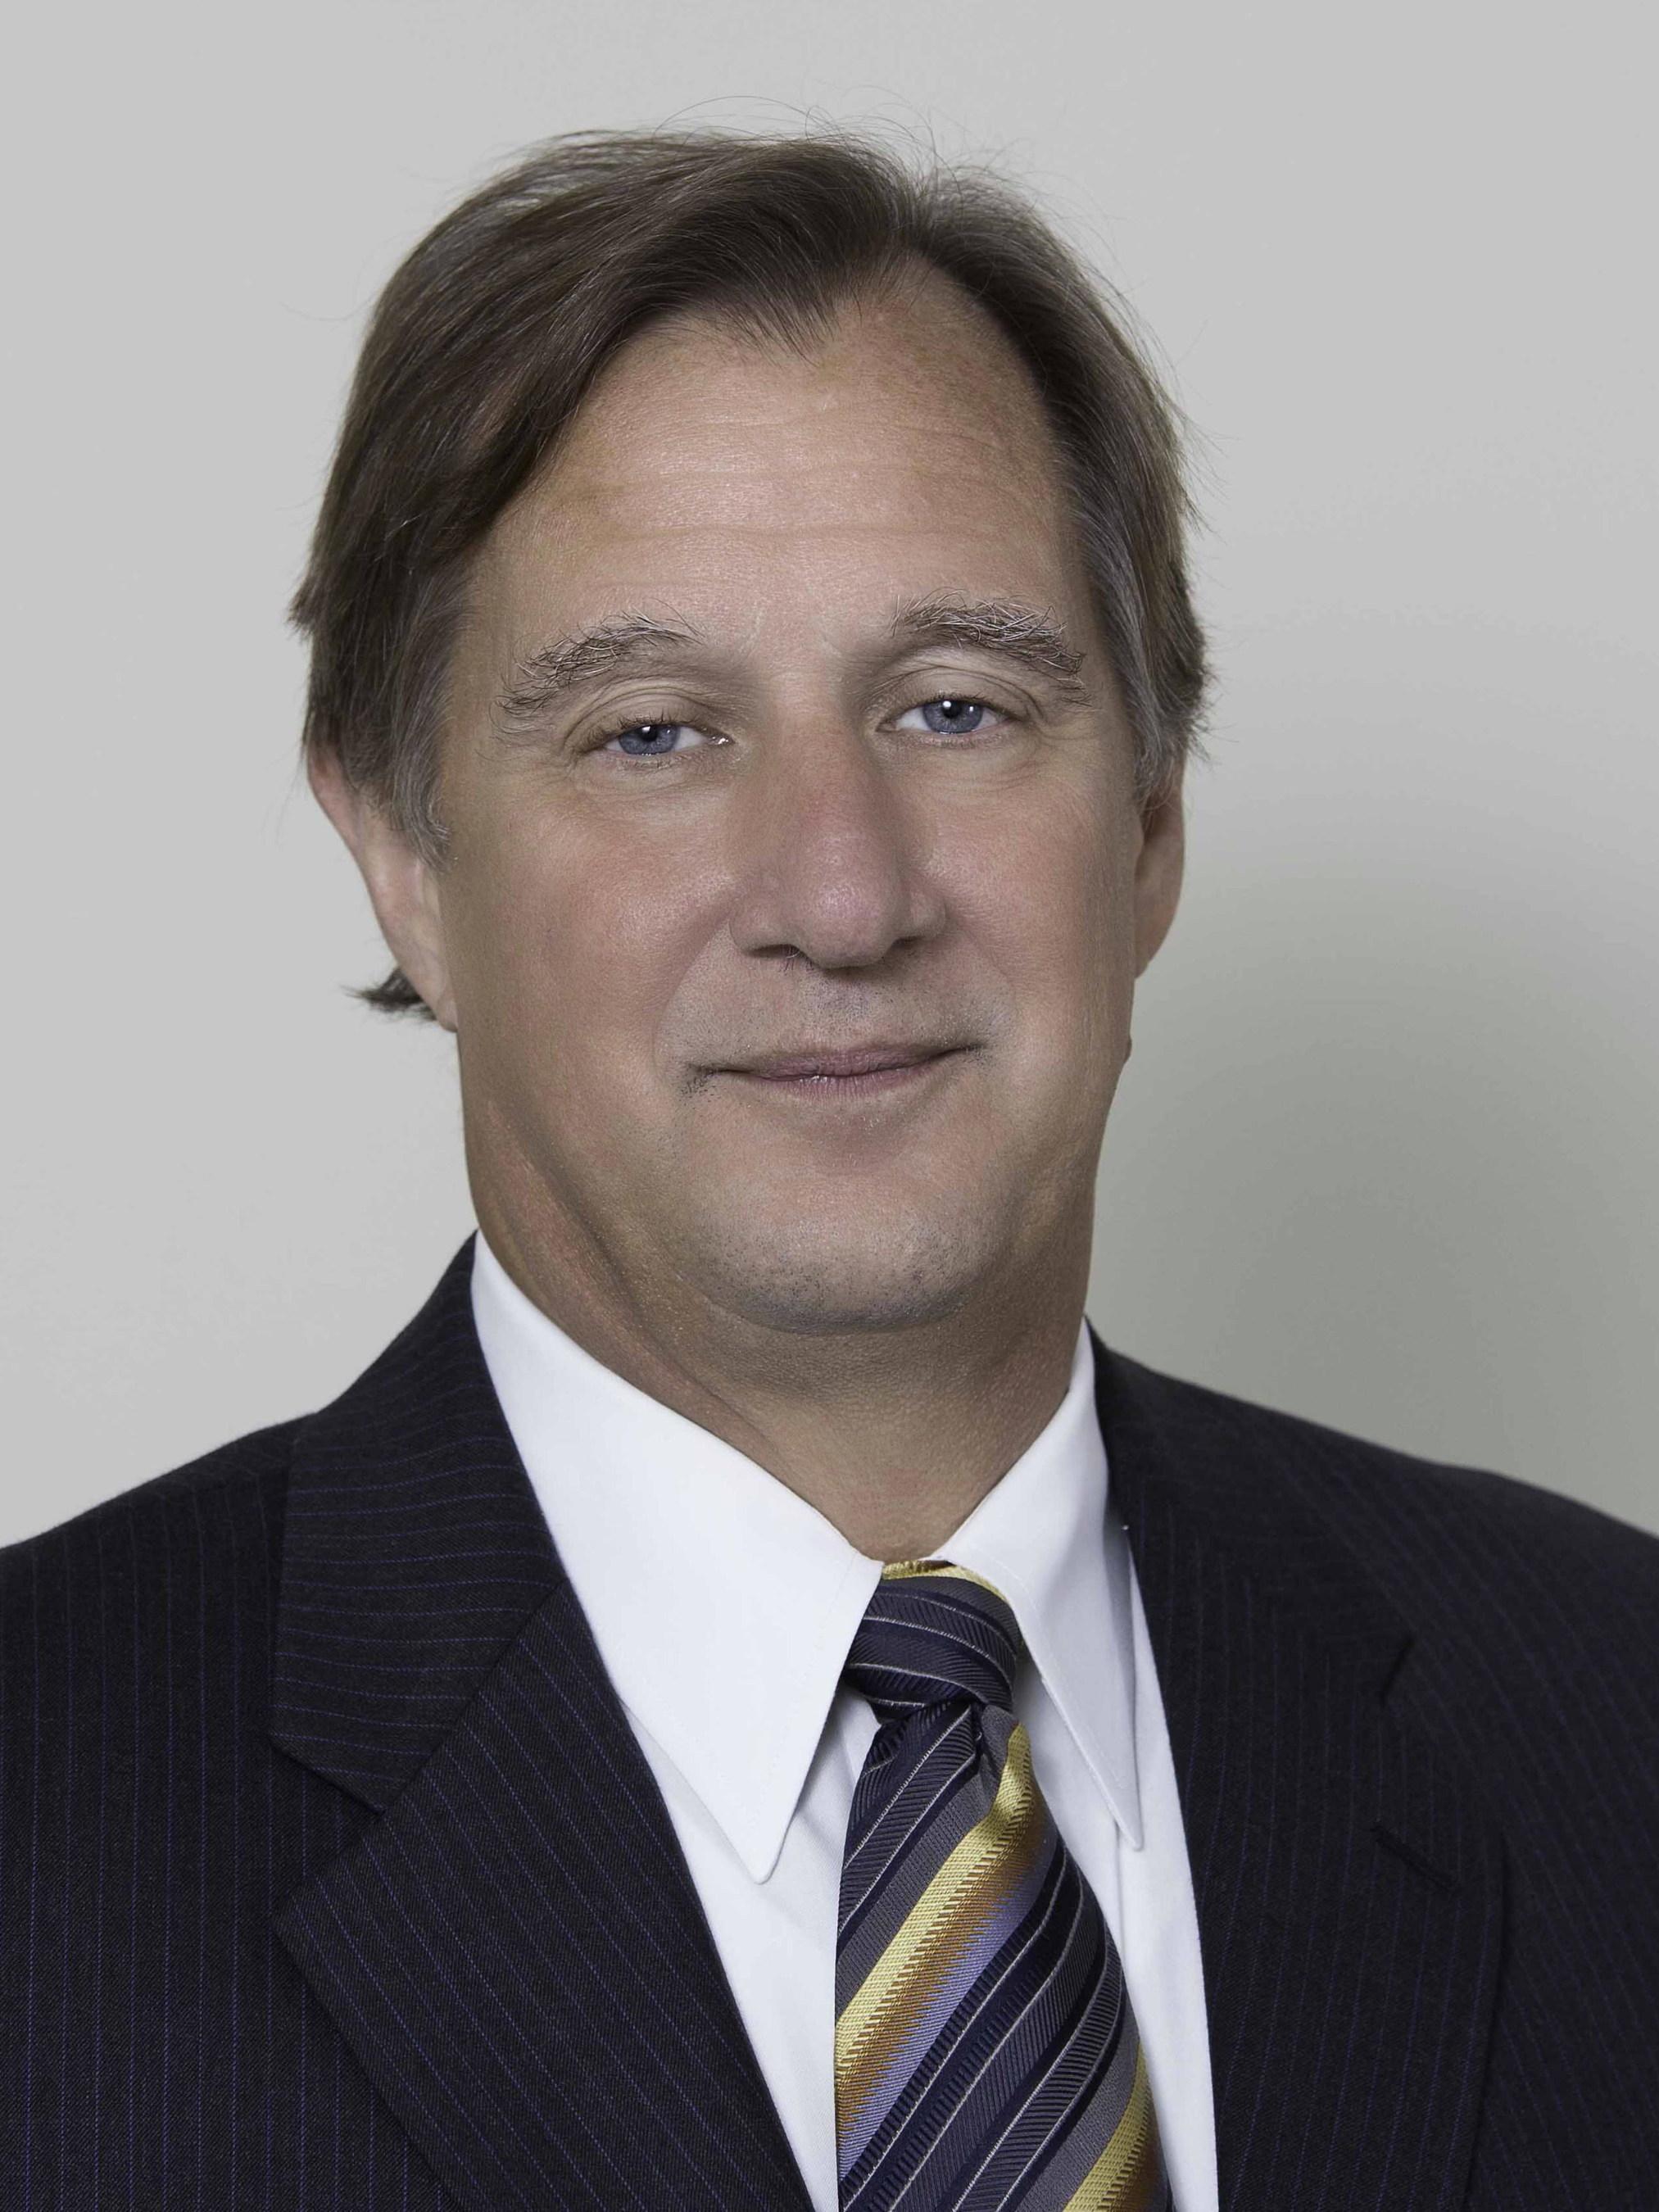 Fontaine Modification President Paul Kokalis Elected to NTEA Board of Trustees